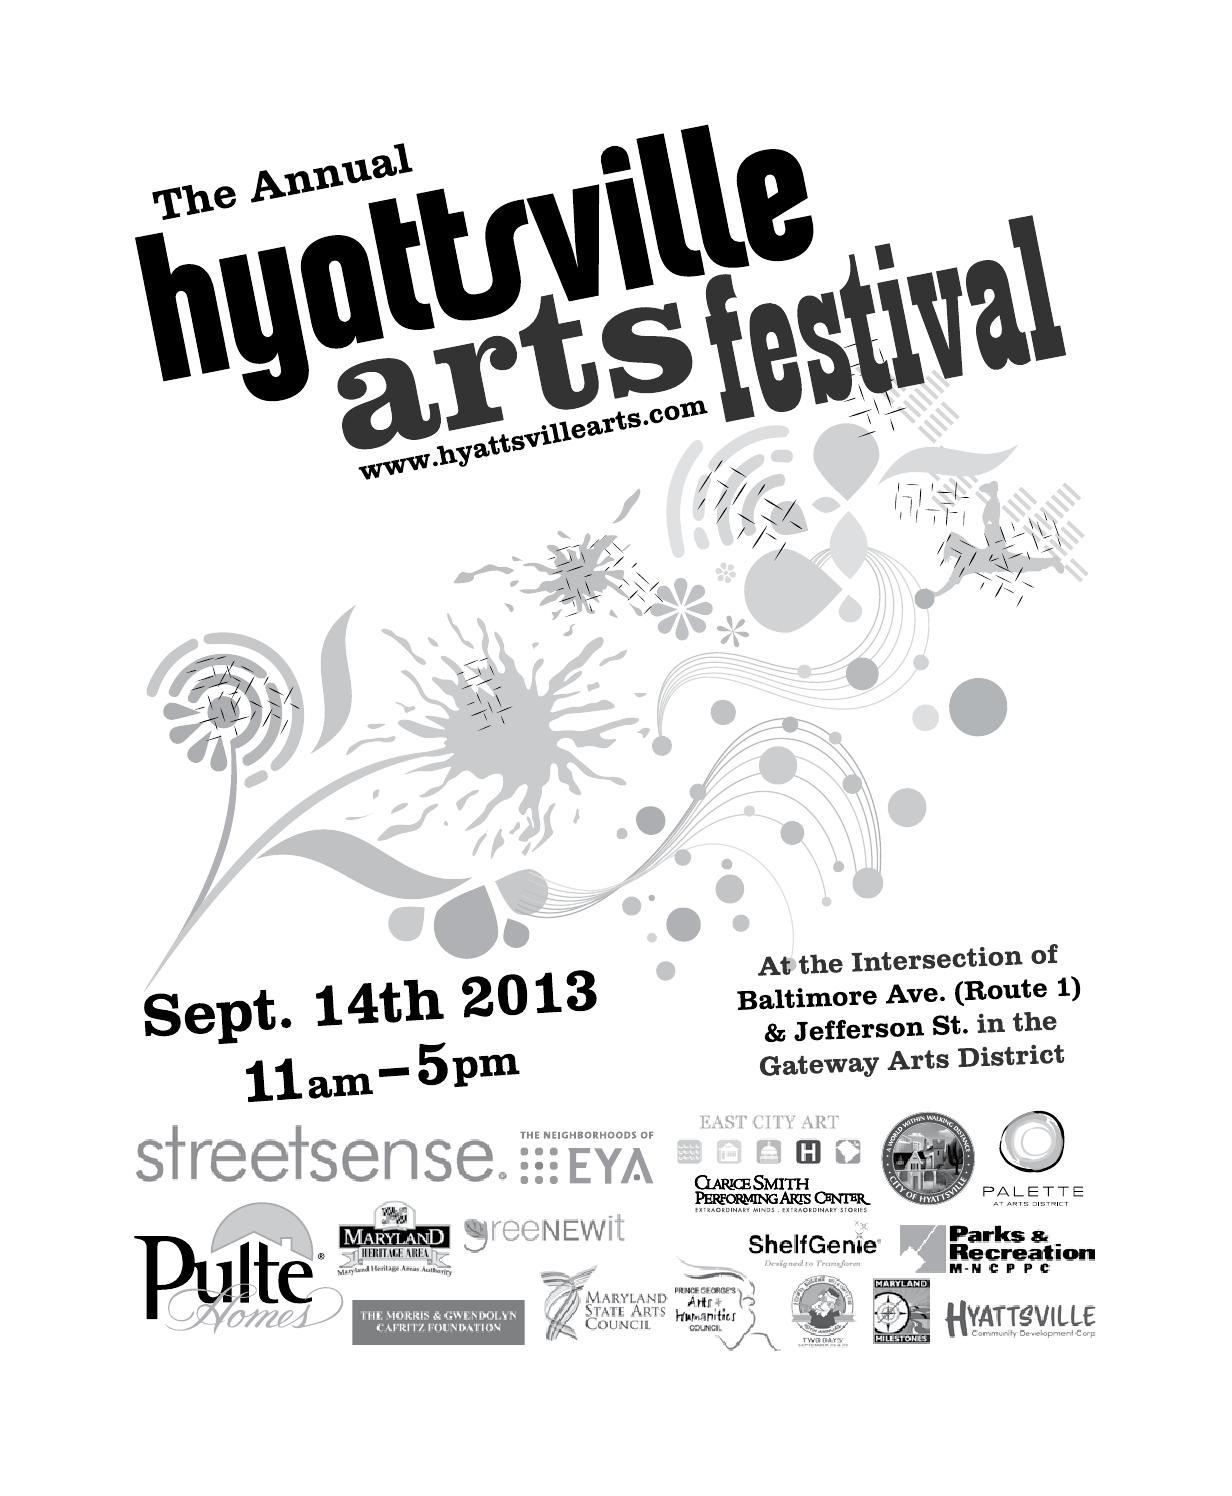 2013 6th Annual Downtown Hyattsville Arts Festival Program